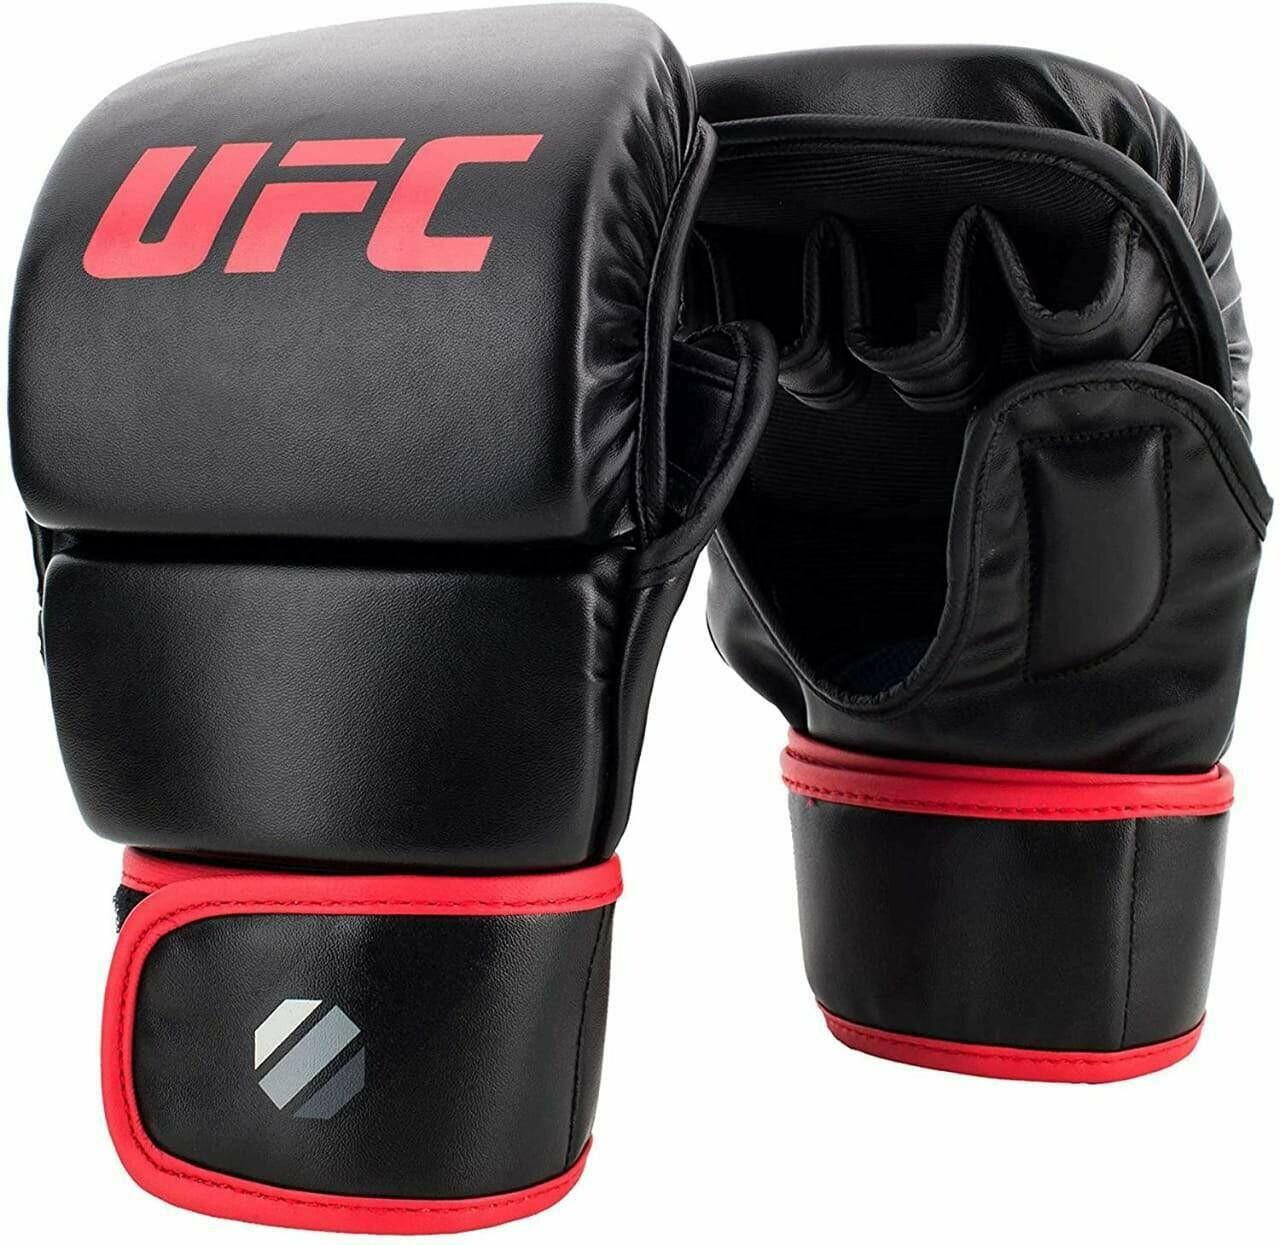 UFC GLOVES SPARRING CONTENDER MMA 8OZ L/XL